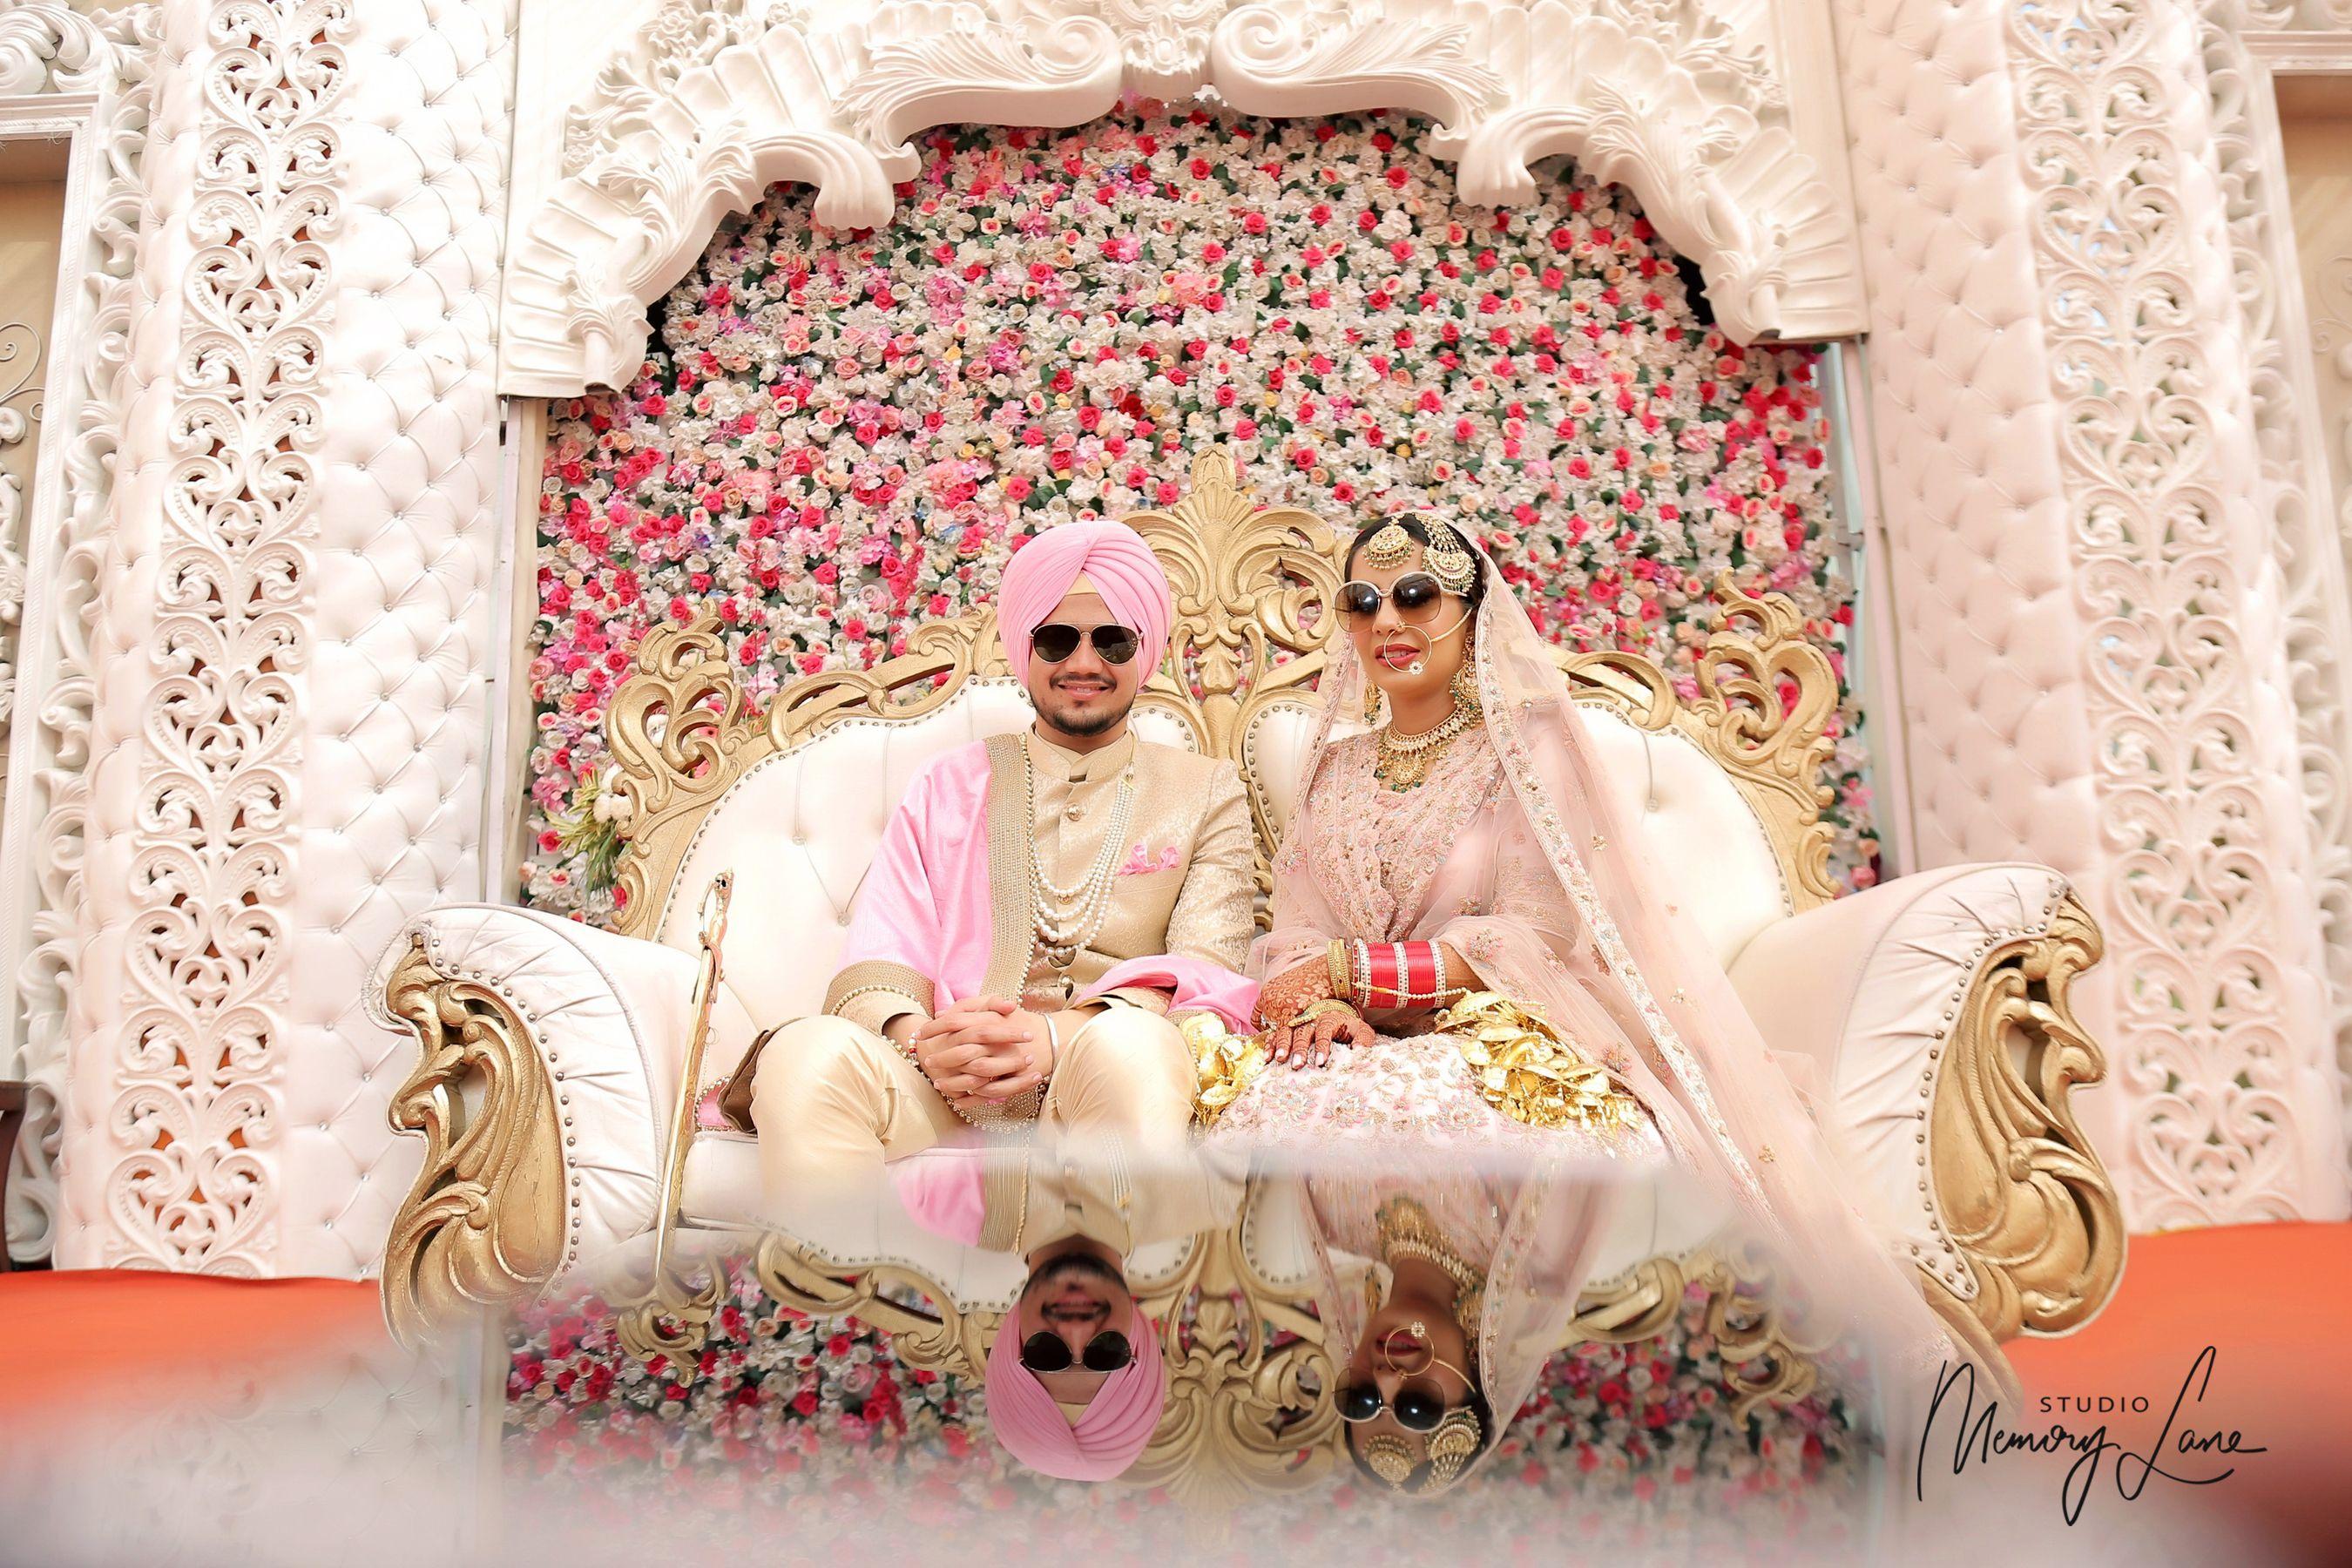 Punjabi Wedding couple captured in candid frames to look rejuvenating in their #WeddingDiaries  #photography #looks #style #wedding #Punjabiwedding #themewedding #prewedding